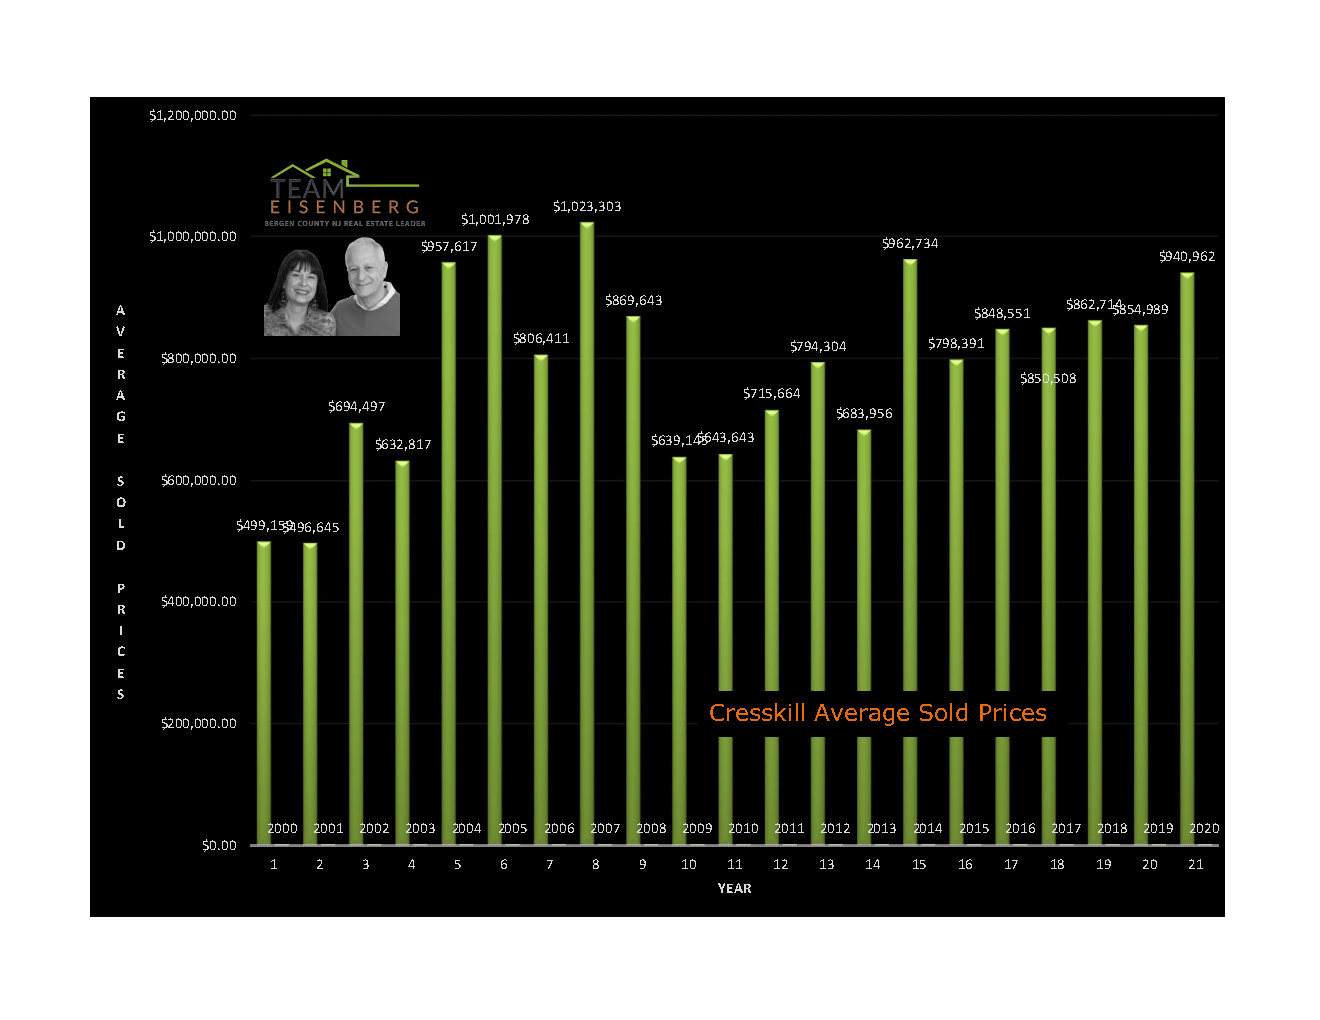 Cresskill | Average Sold Prices | 2000-2020